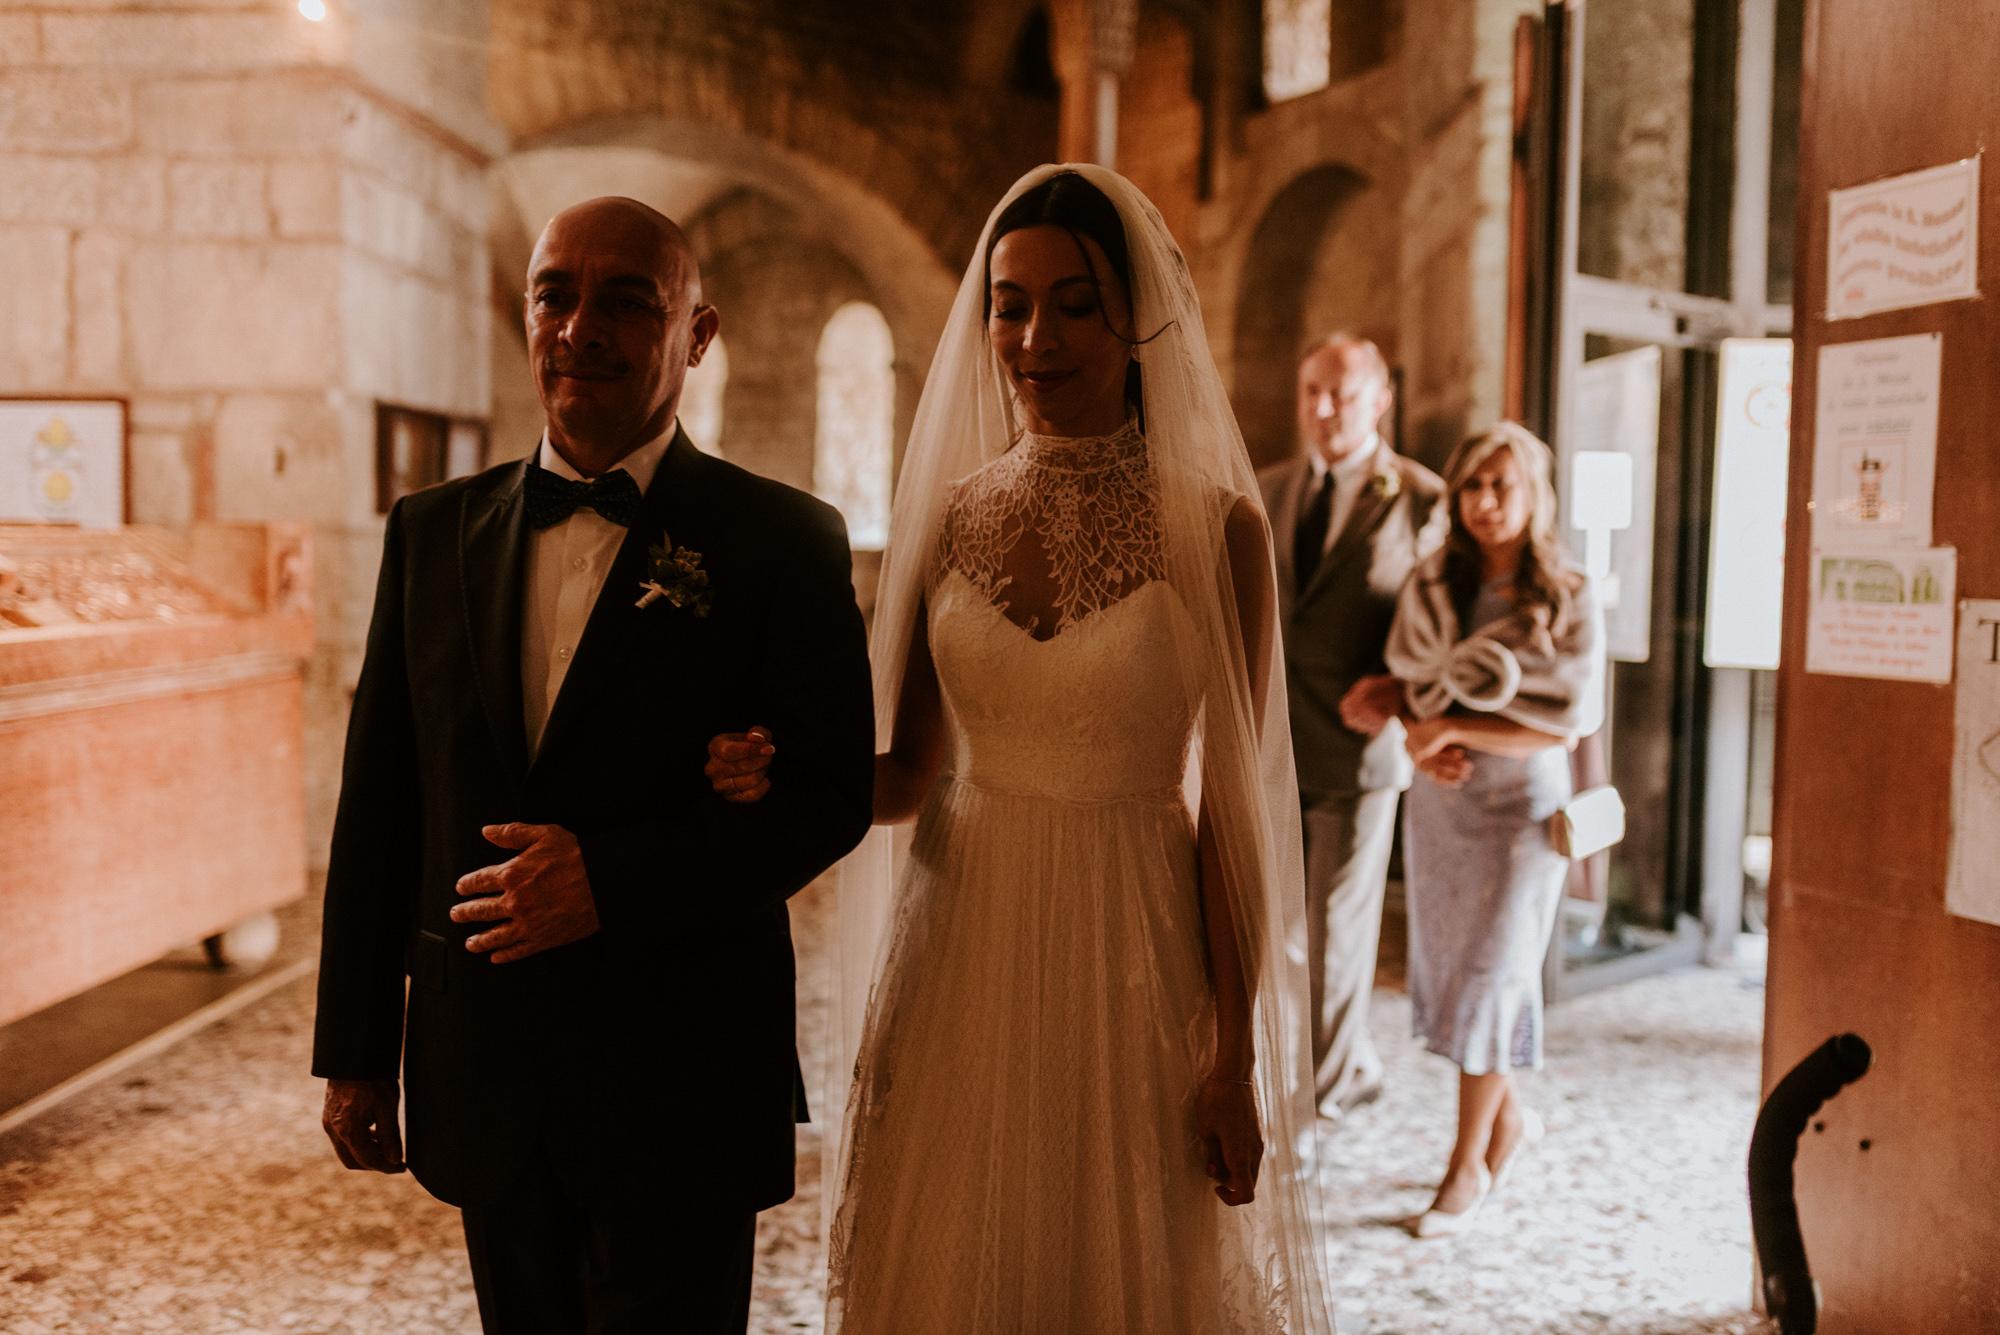 FOTO+PHOTO+BODA+WEDDING+ITALIA+ITALY+MAURICIO+GARAY+MAURICIOGARAY+WEDDINPHOTOGRAPHER+FOTOGRAFODEBODA-737.jpg